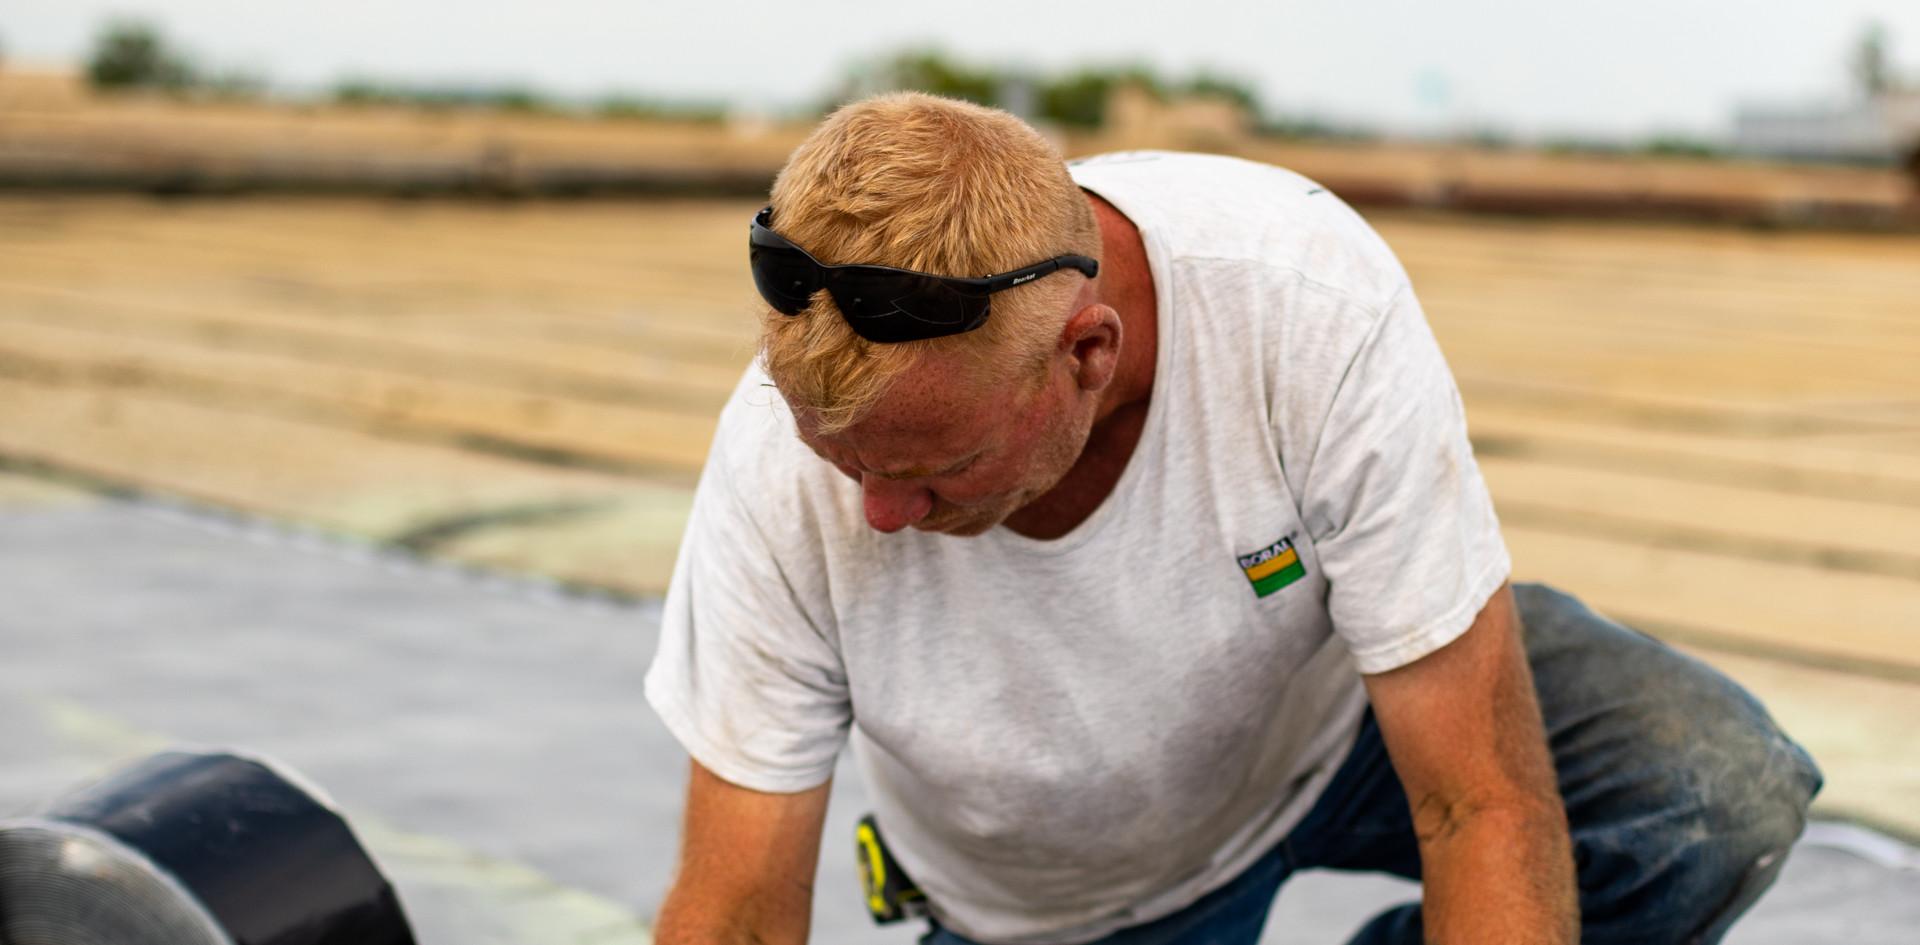 Eric-Hopkins-Roofing-Crews